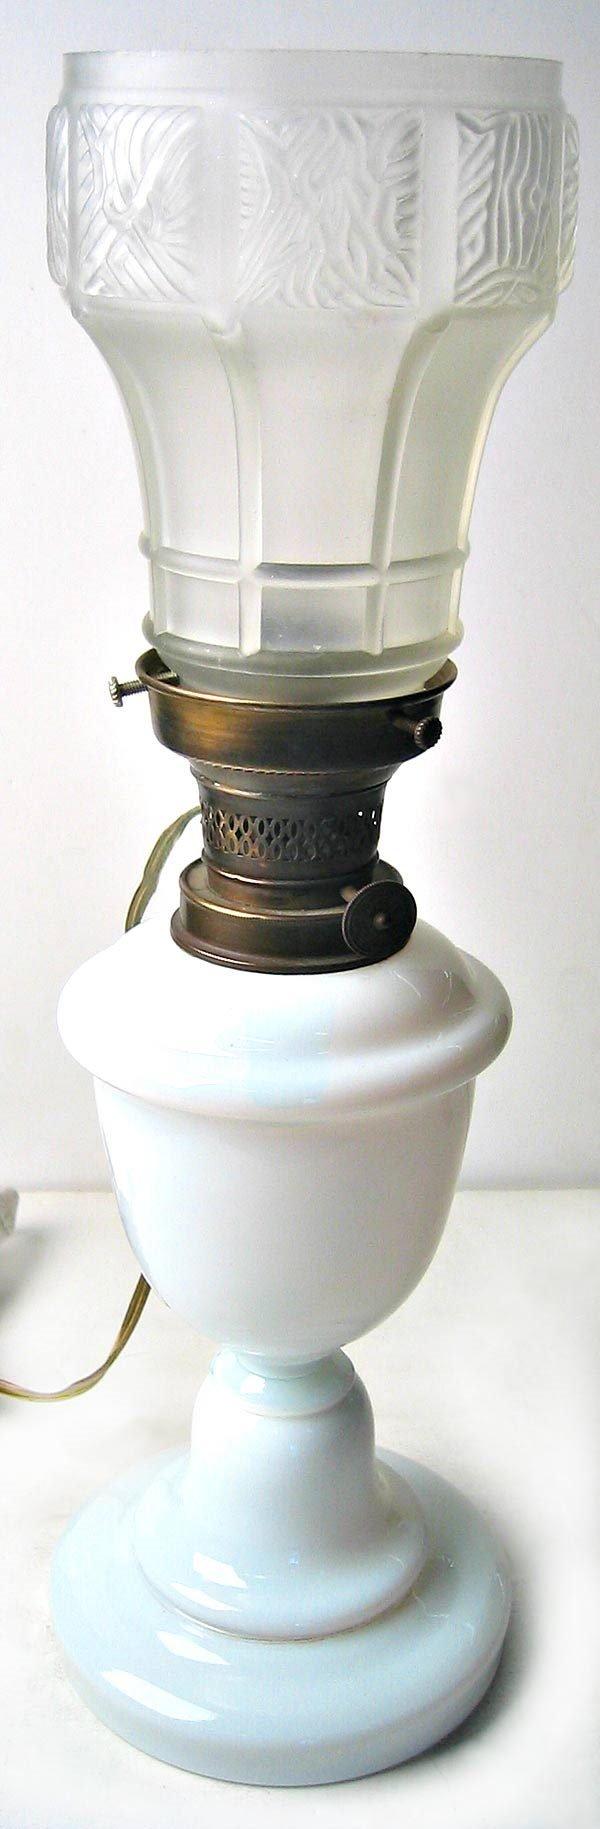 4973: Milk glass table lamp